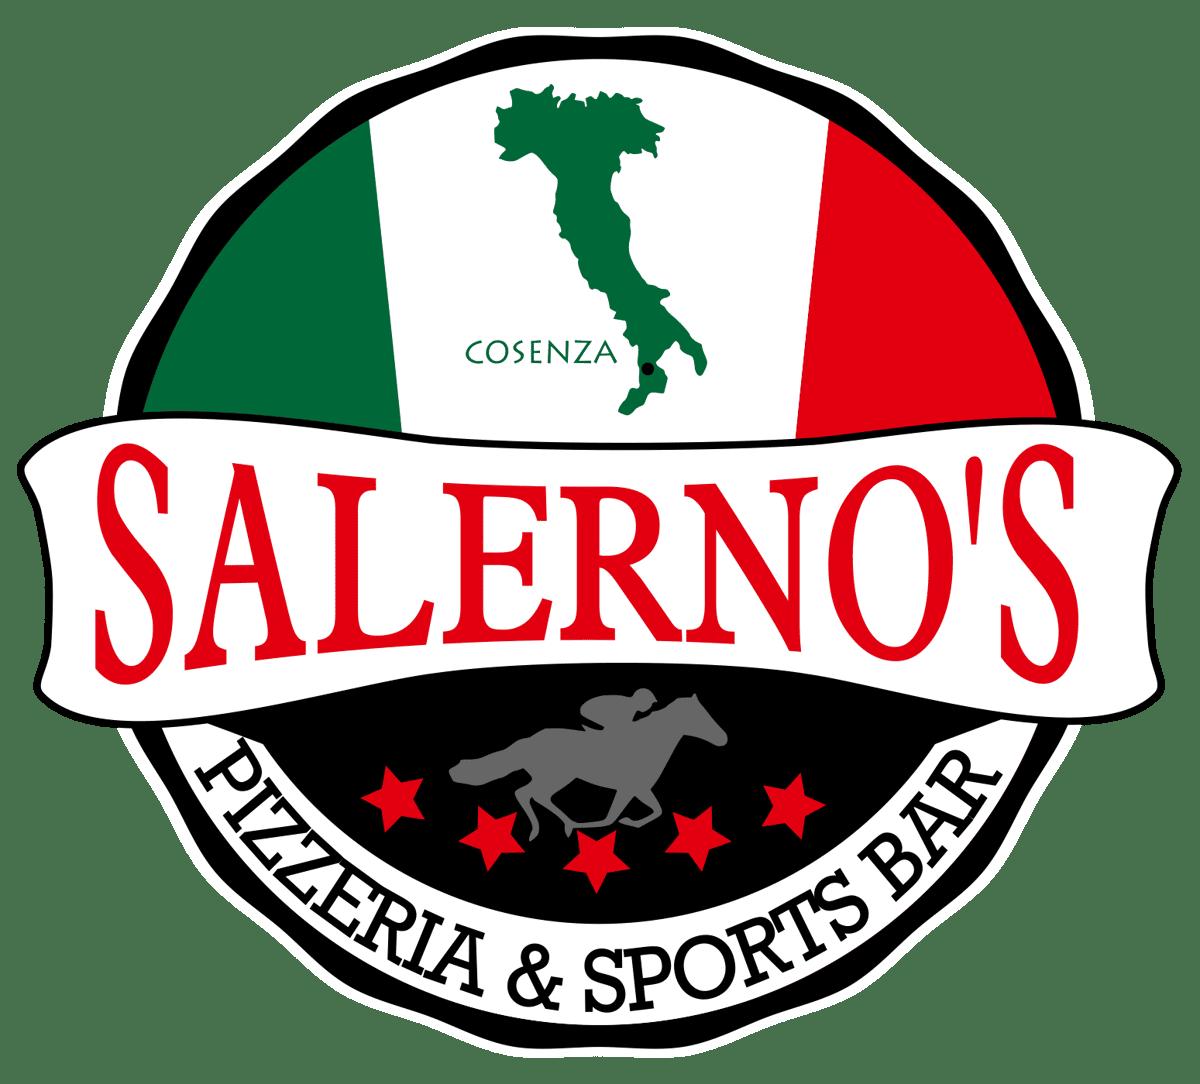 pizzeria and sports bar logo